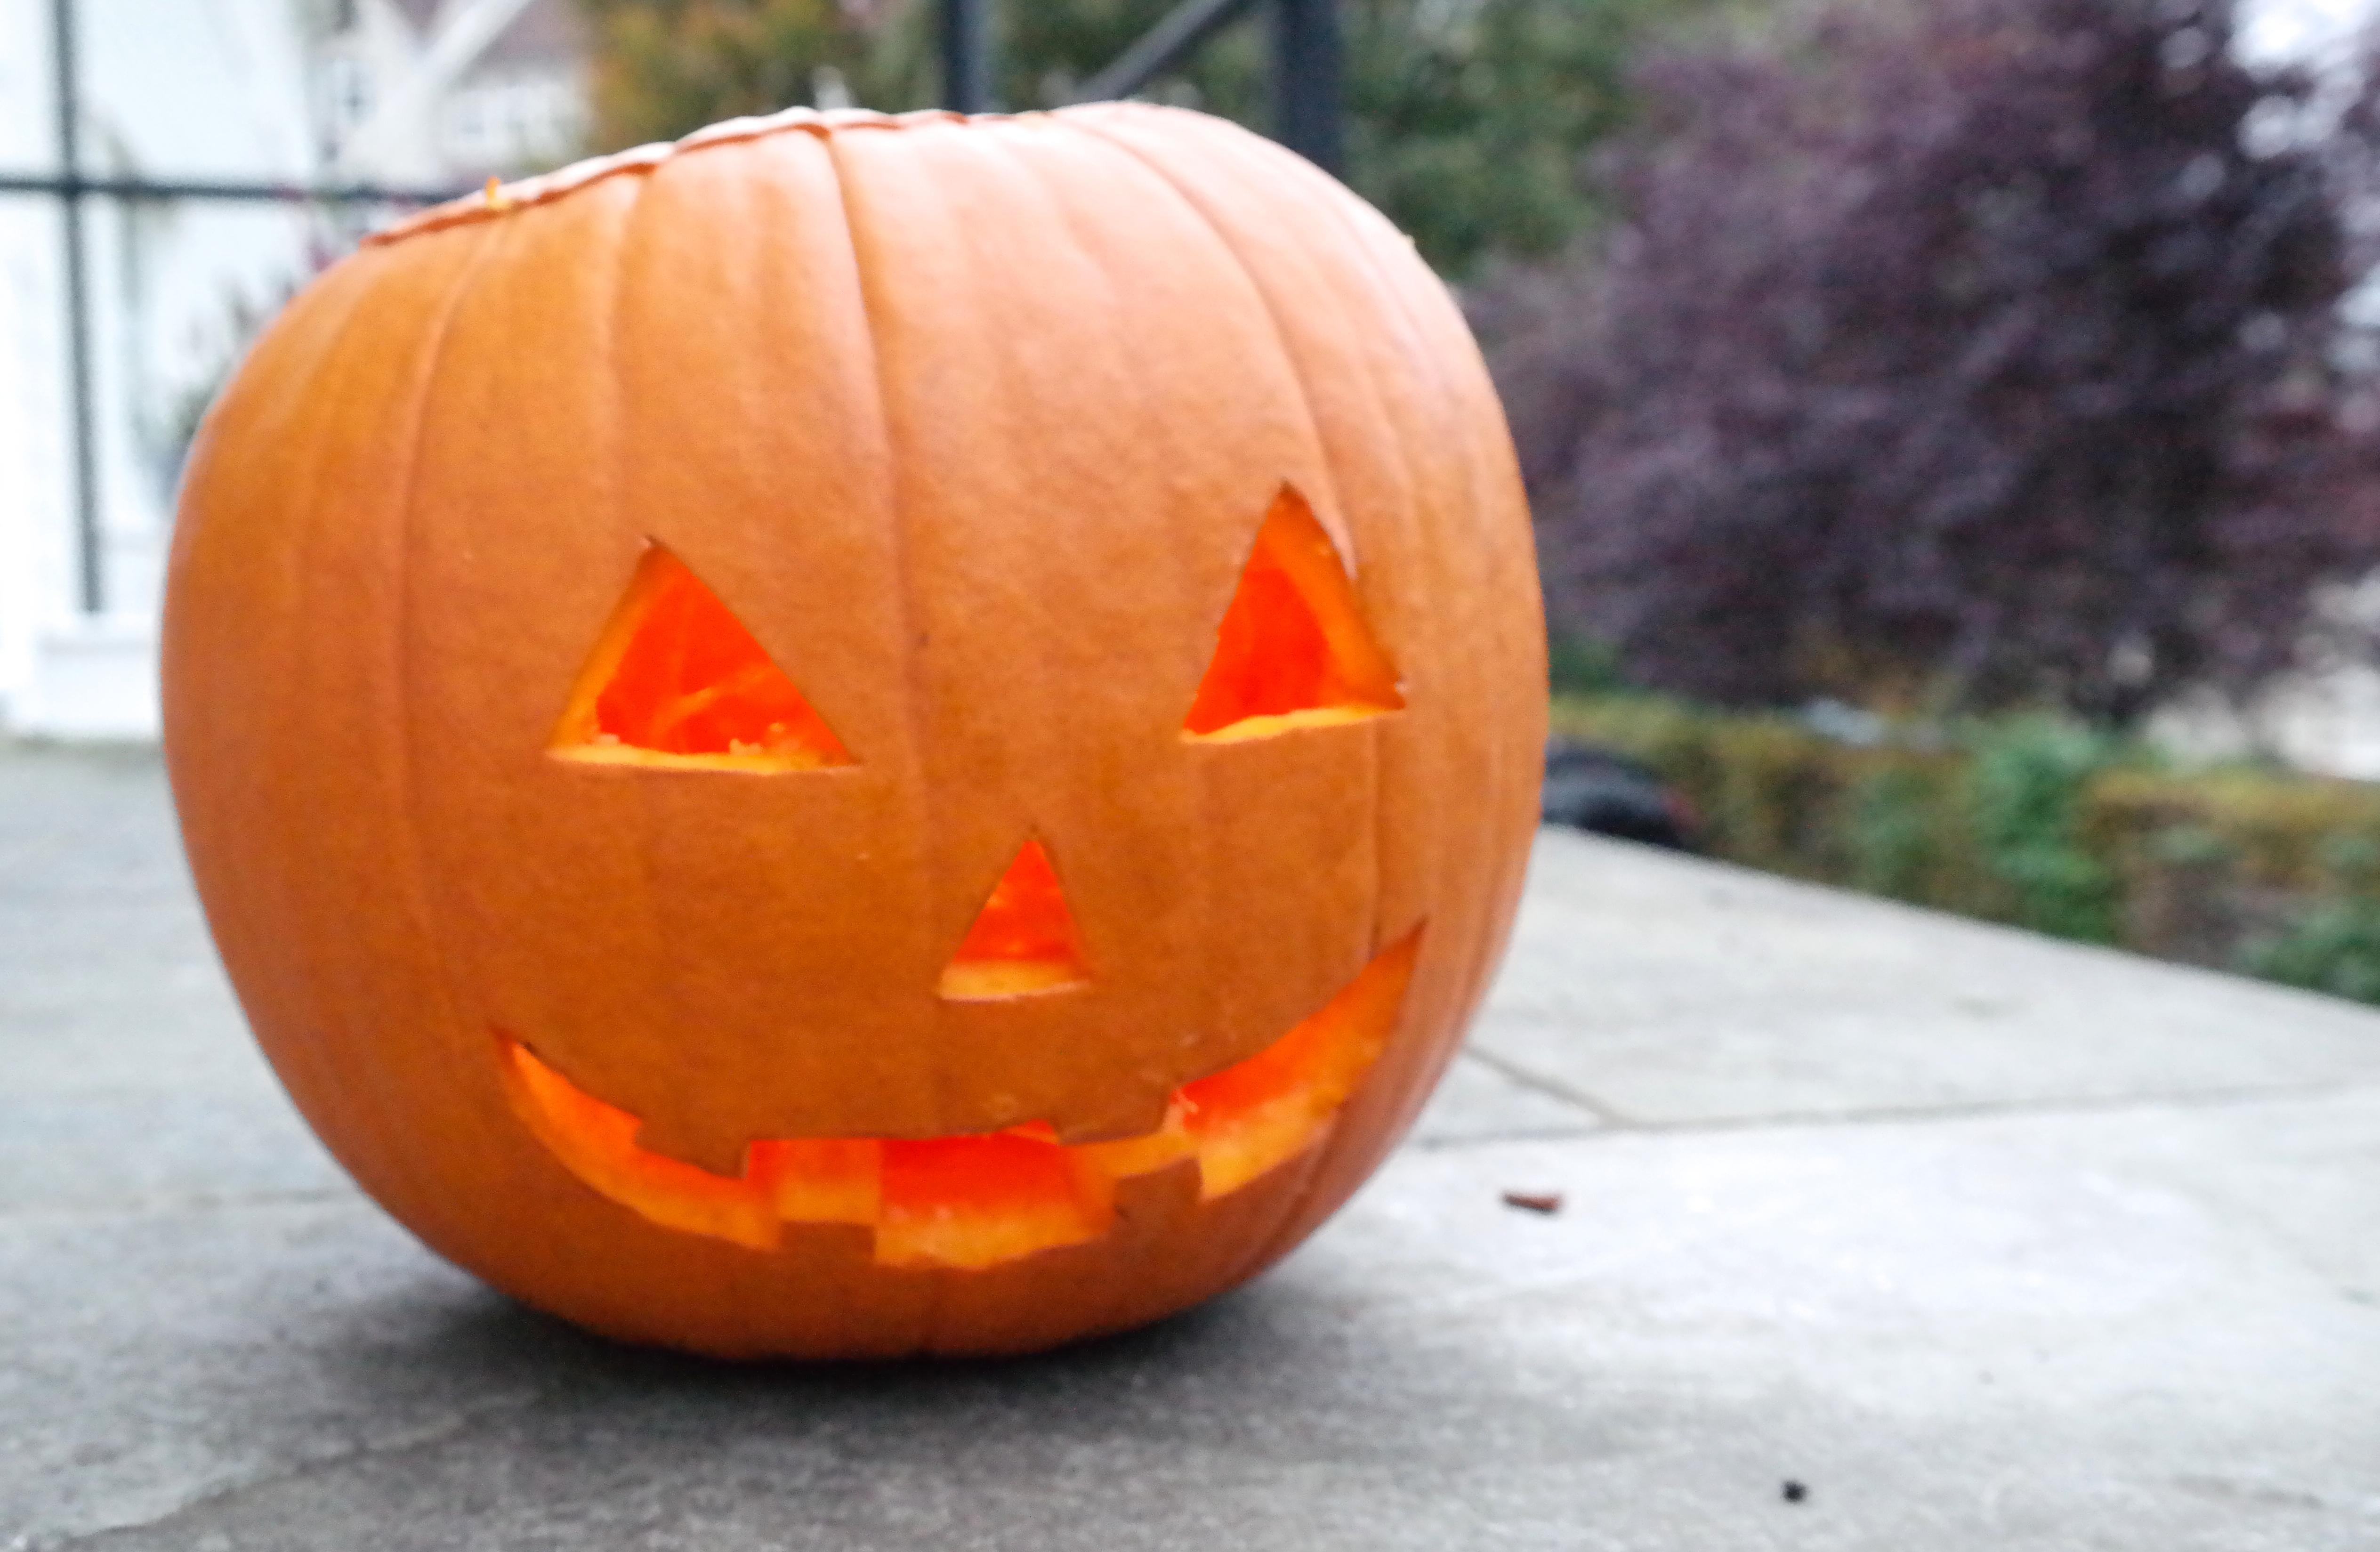 Lag din egen Gresskarlykt til Halloween